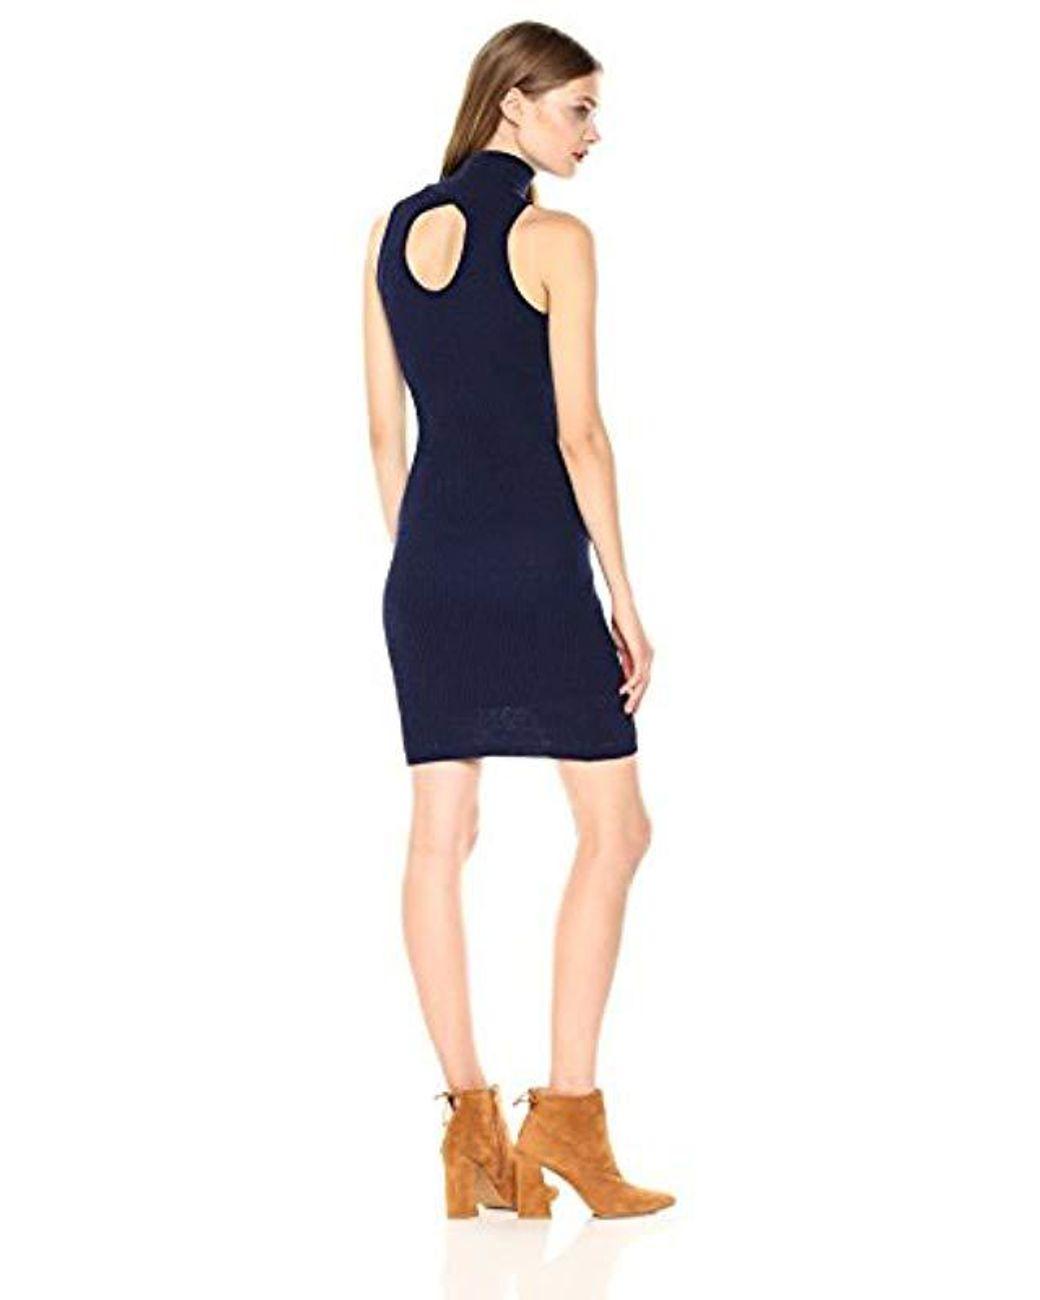 Women's Blue We Shall Overcome Sleeveless Turtleneck Bodycon Sweater Dress